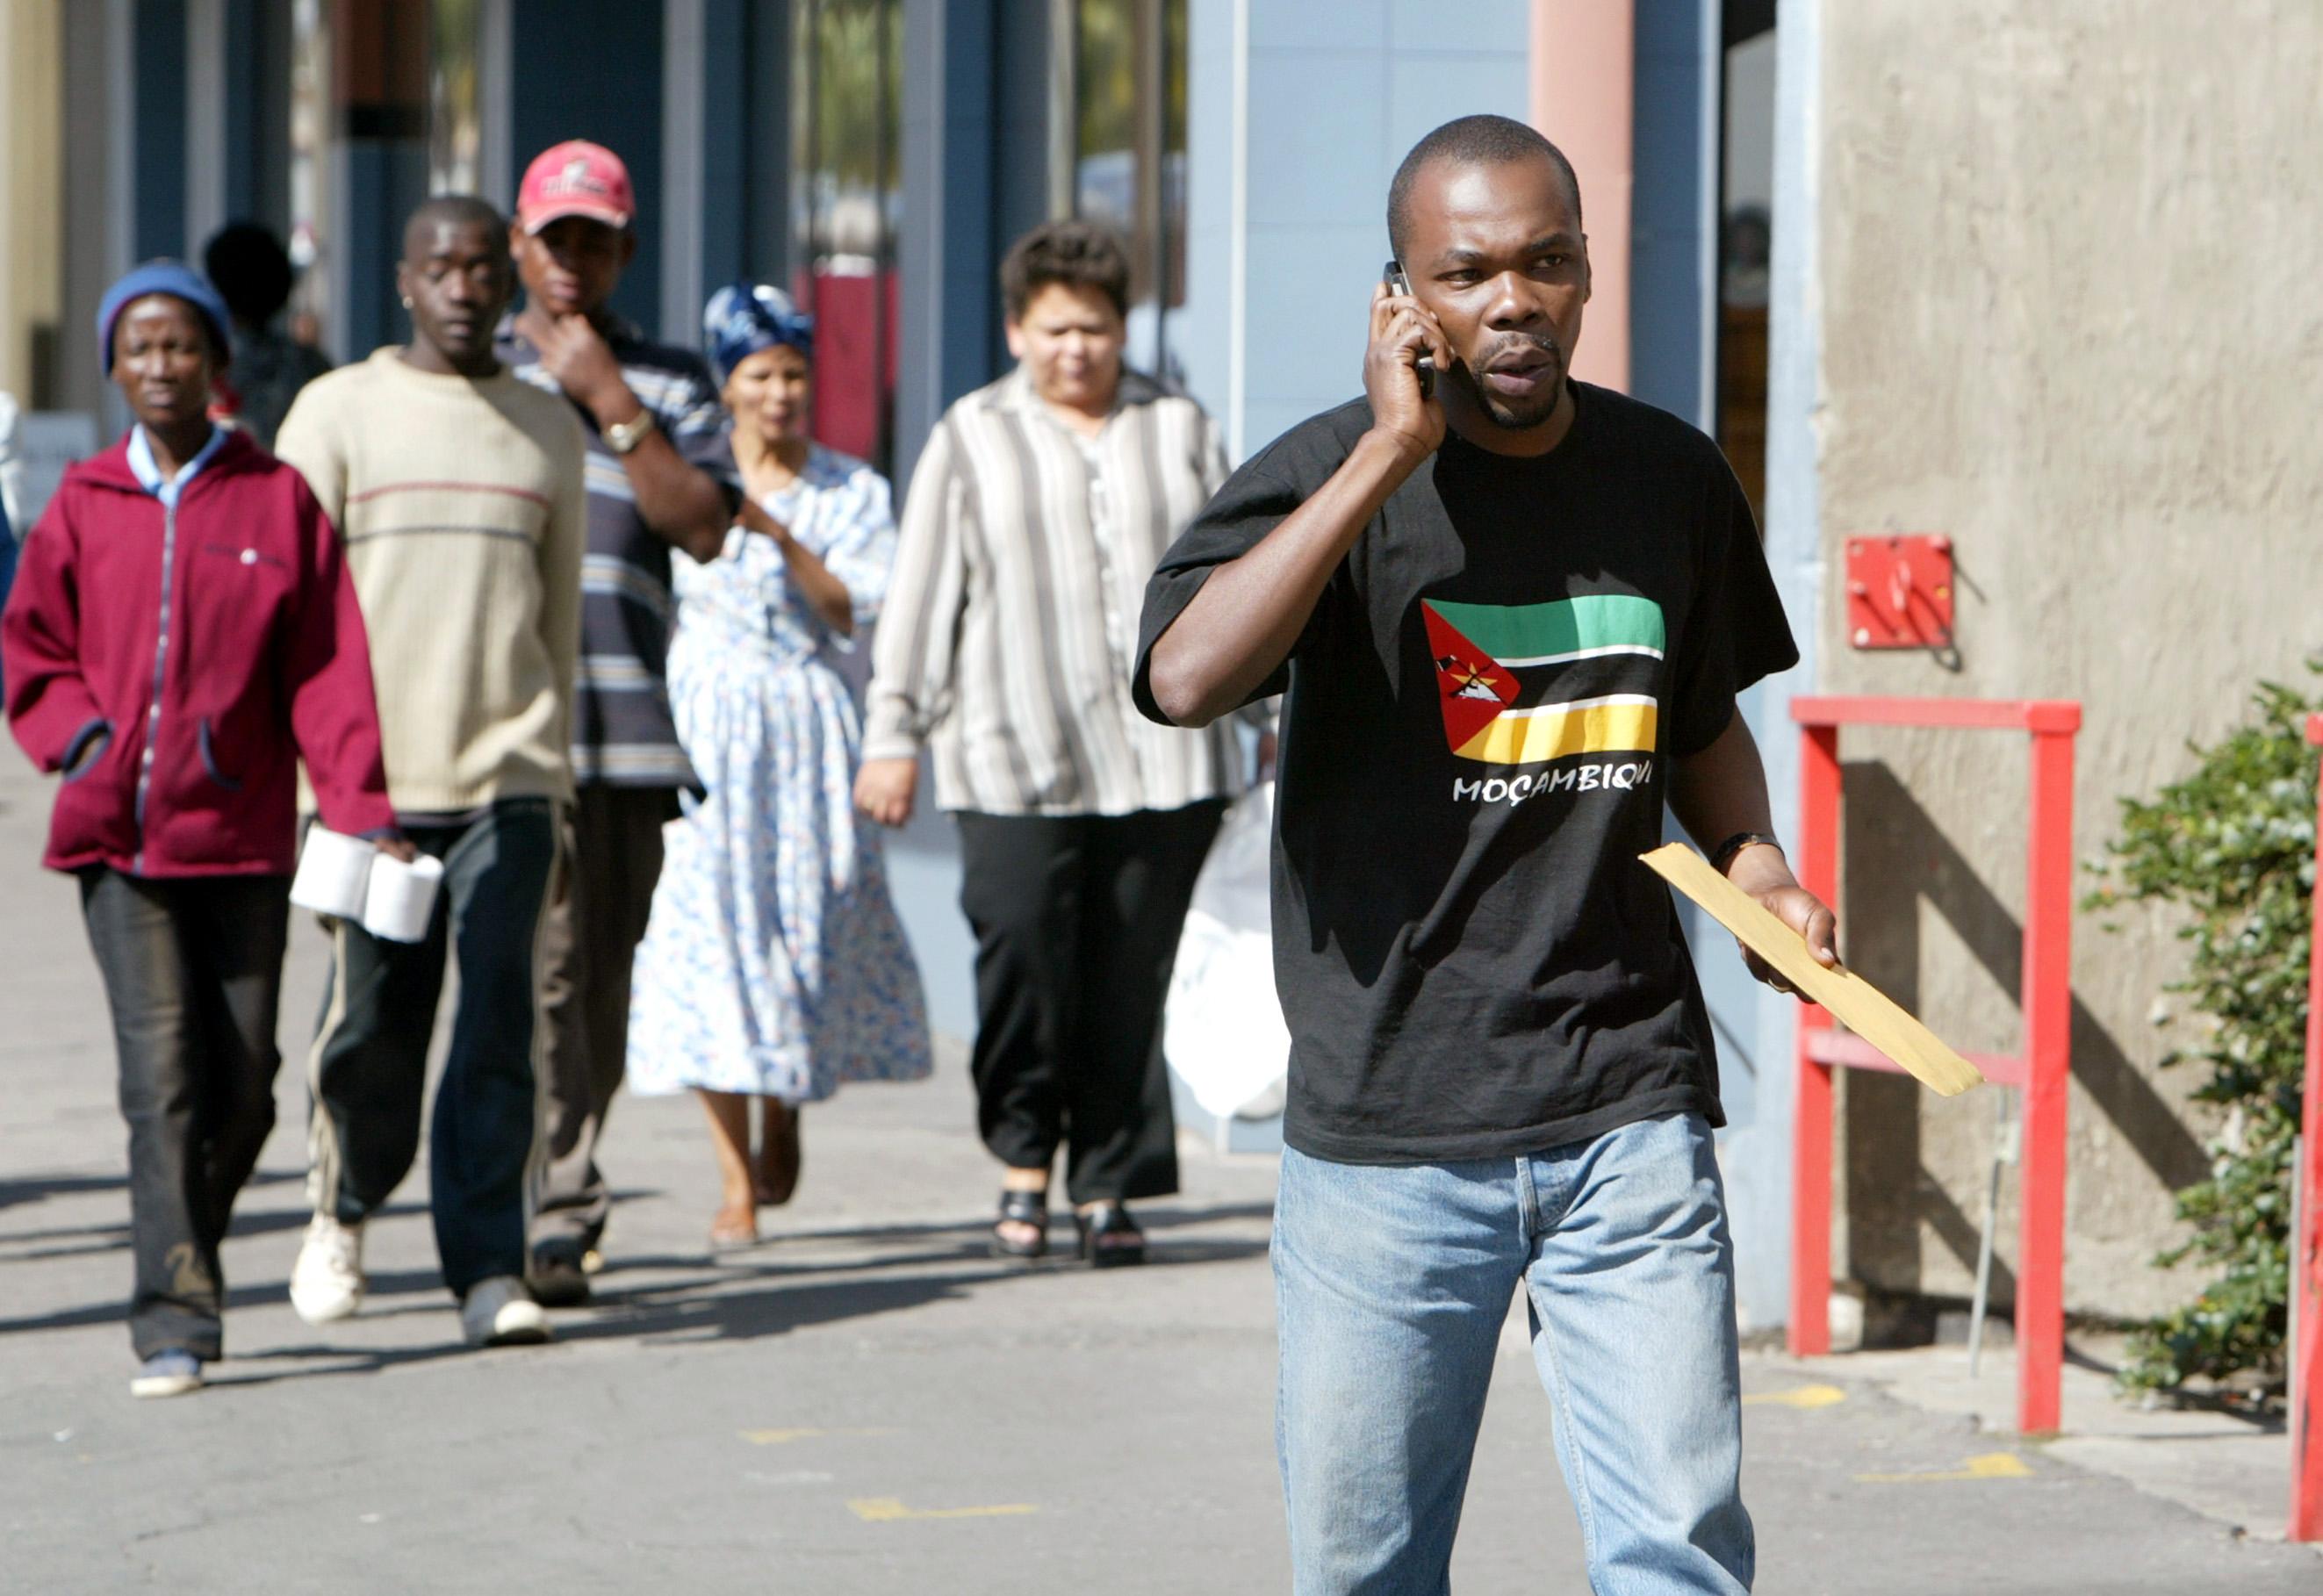 Fußgänger mit Mobiltelefon in Windhuk, Namibia